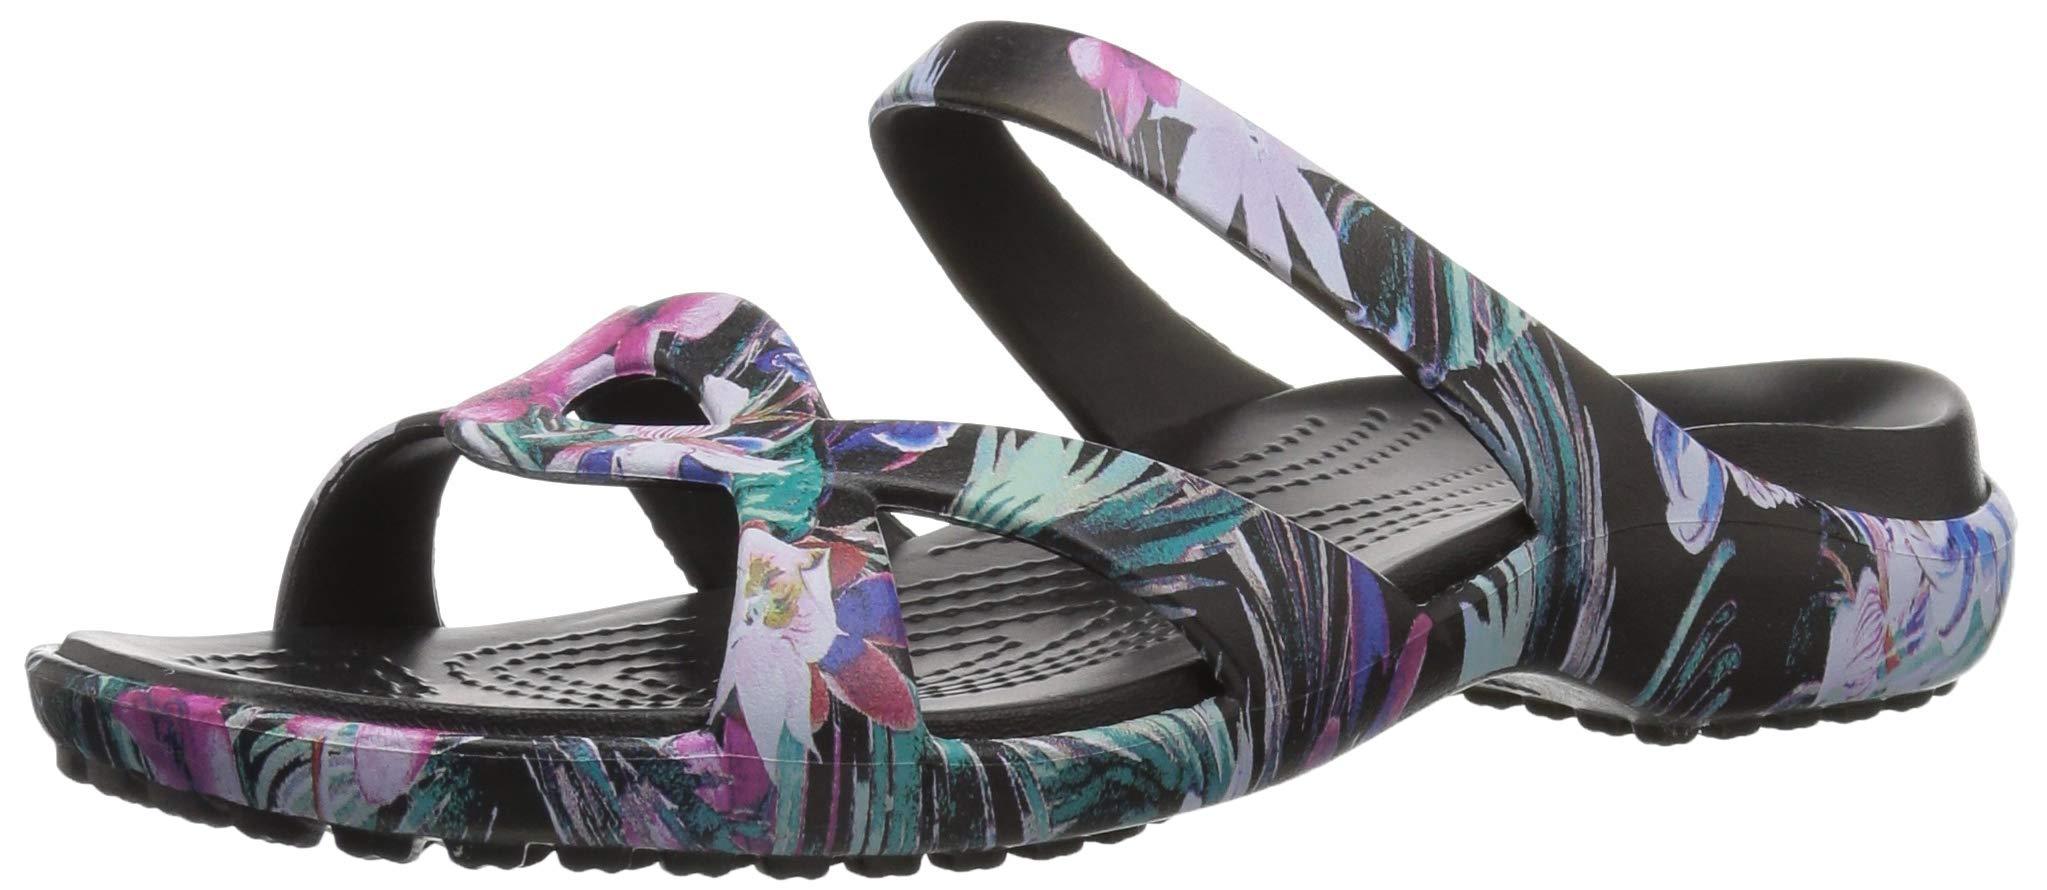 Crocs Women's Meleen Twist Graphic Slide Sandal, Tropical Floral, 7 M US